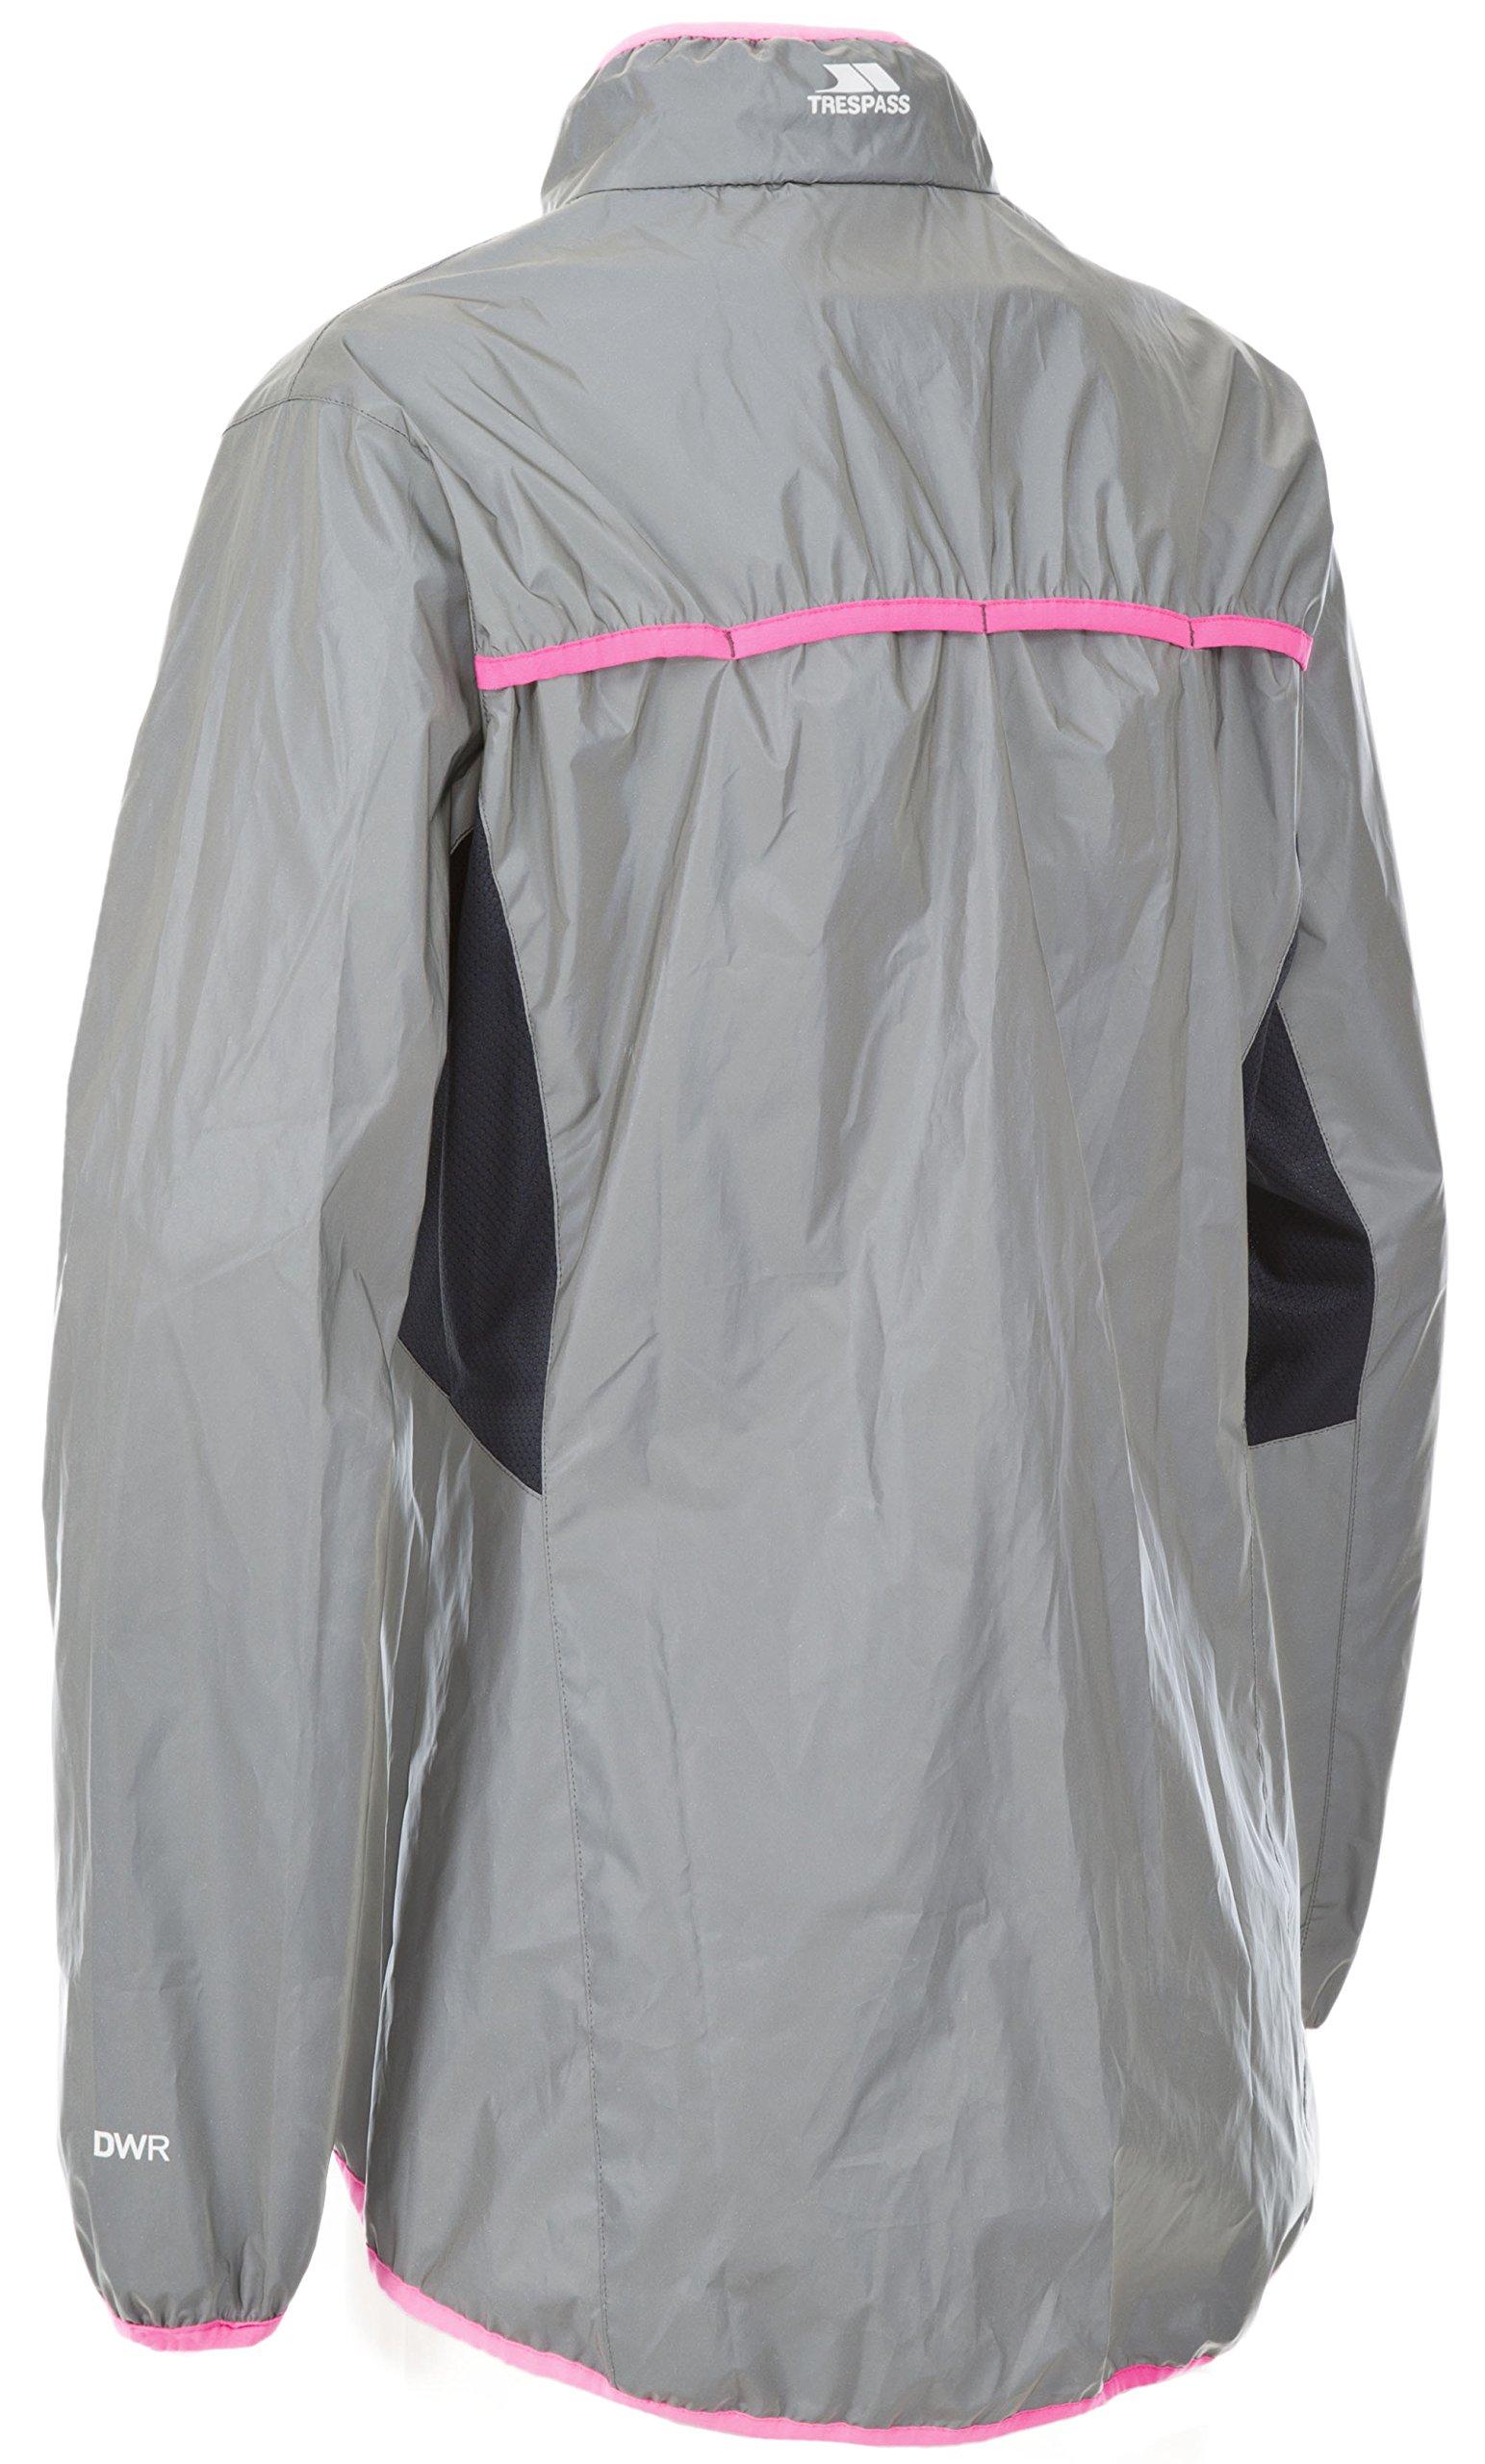 Trespass Women's Lumi Active Windproof and Waterproof Cycling and Running Outdoor Luminous Jacket 2